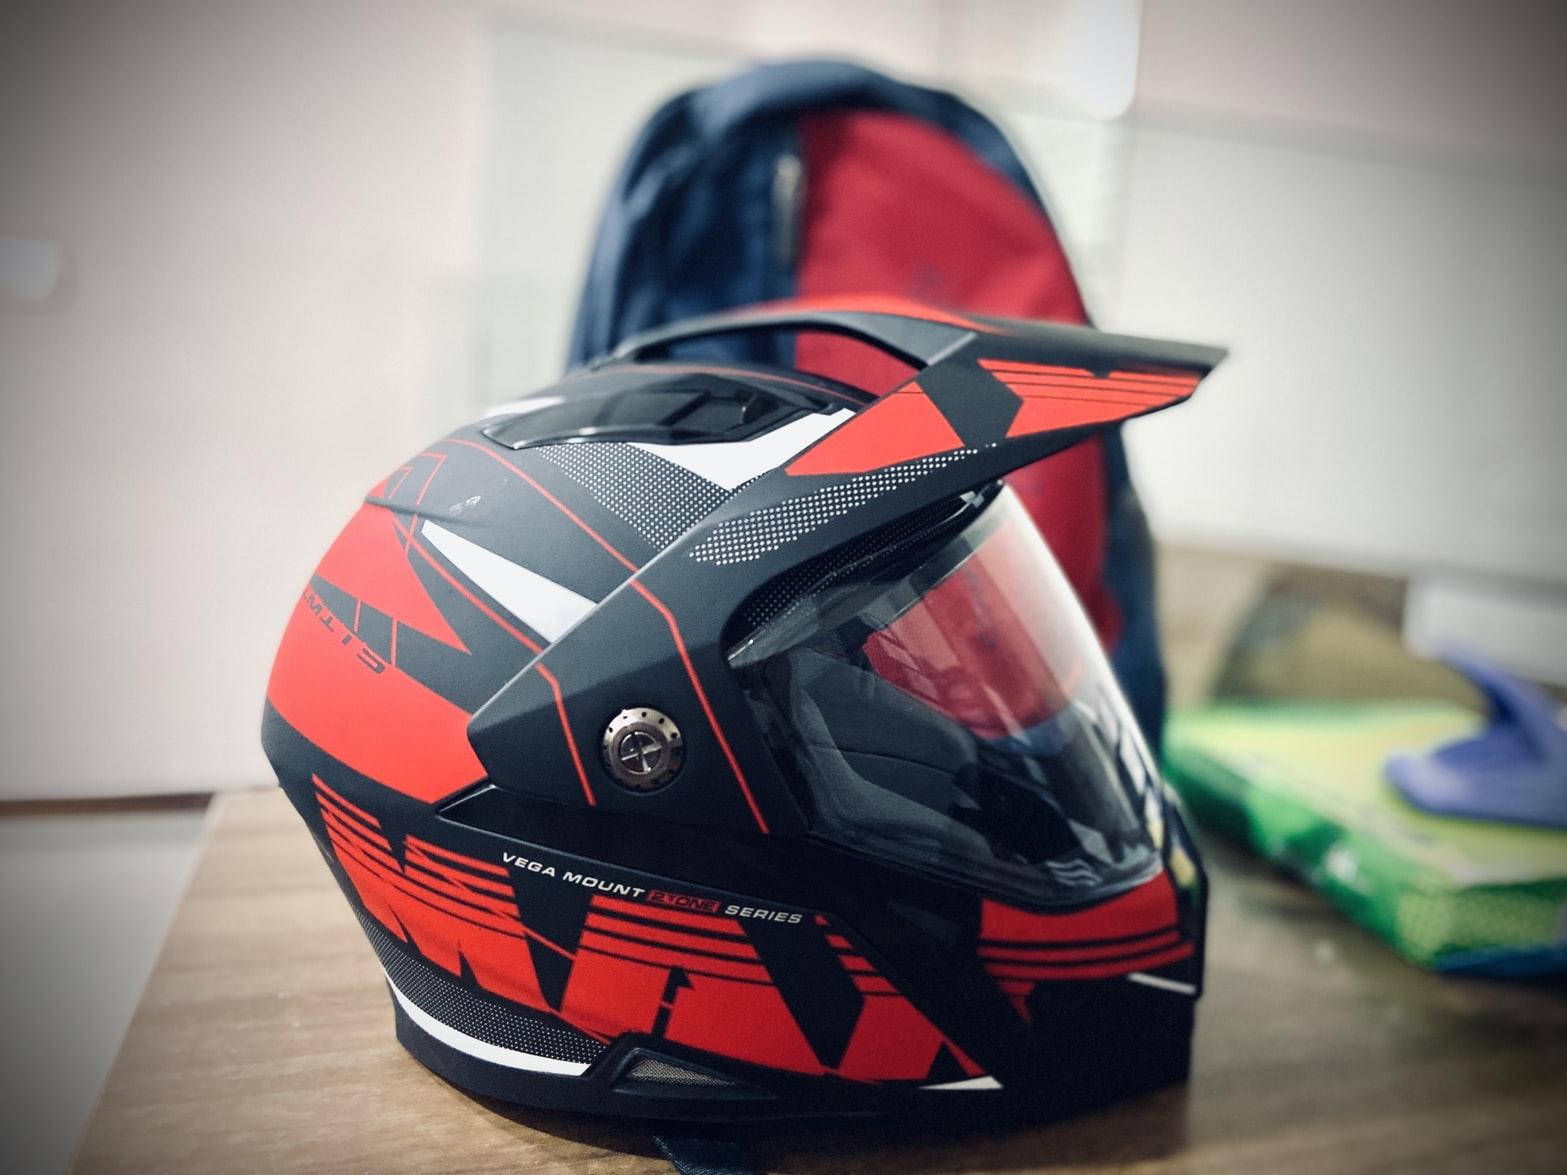 Daftar Harga Helm MTX Trail dan Supermoto Yamaha